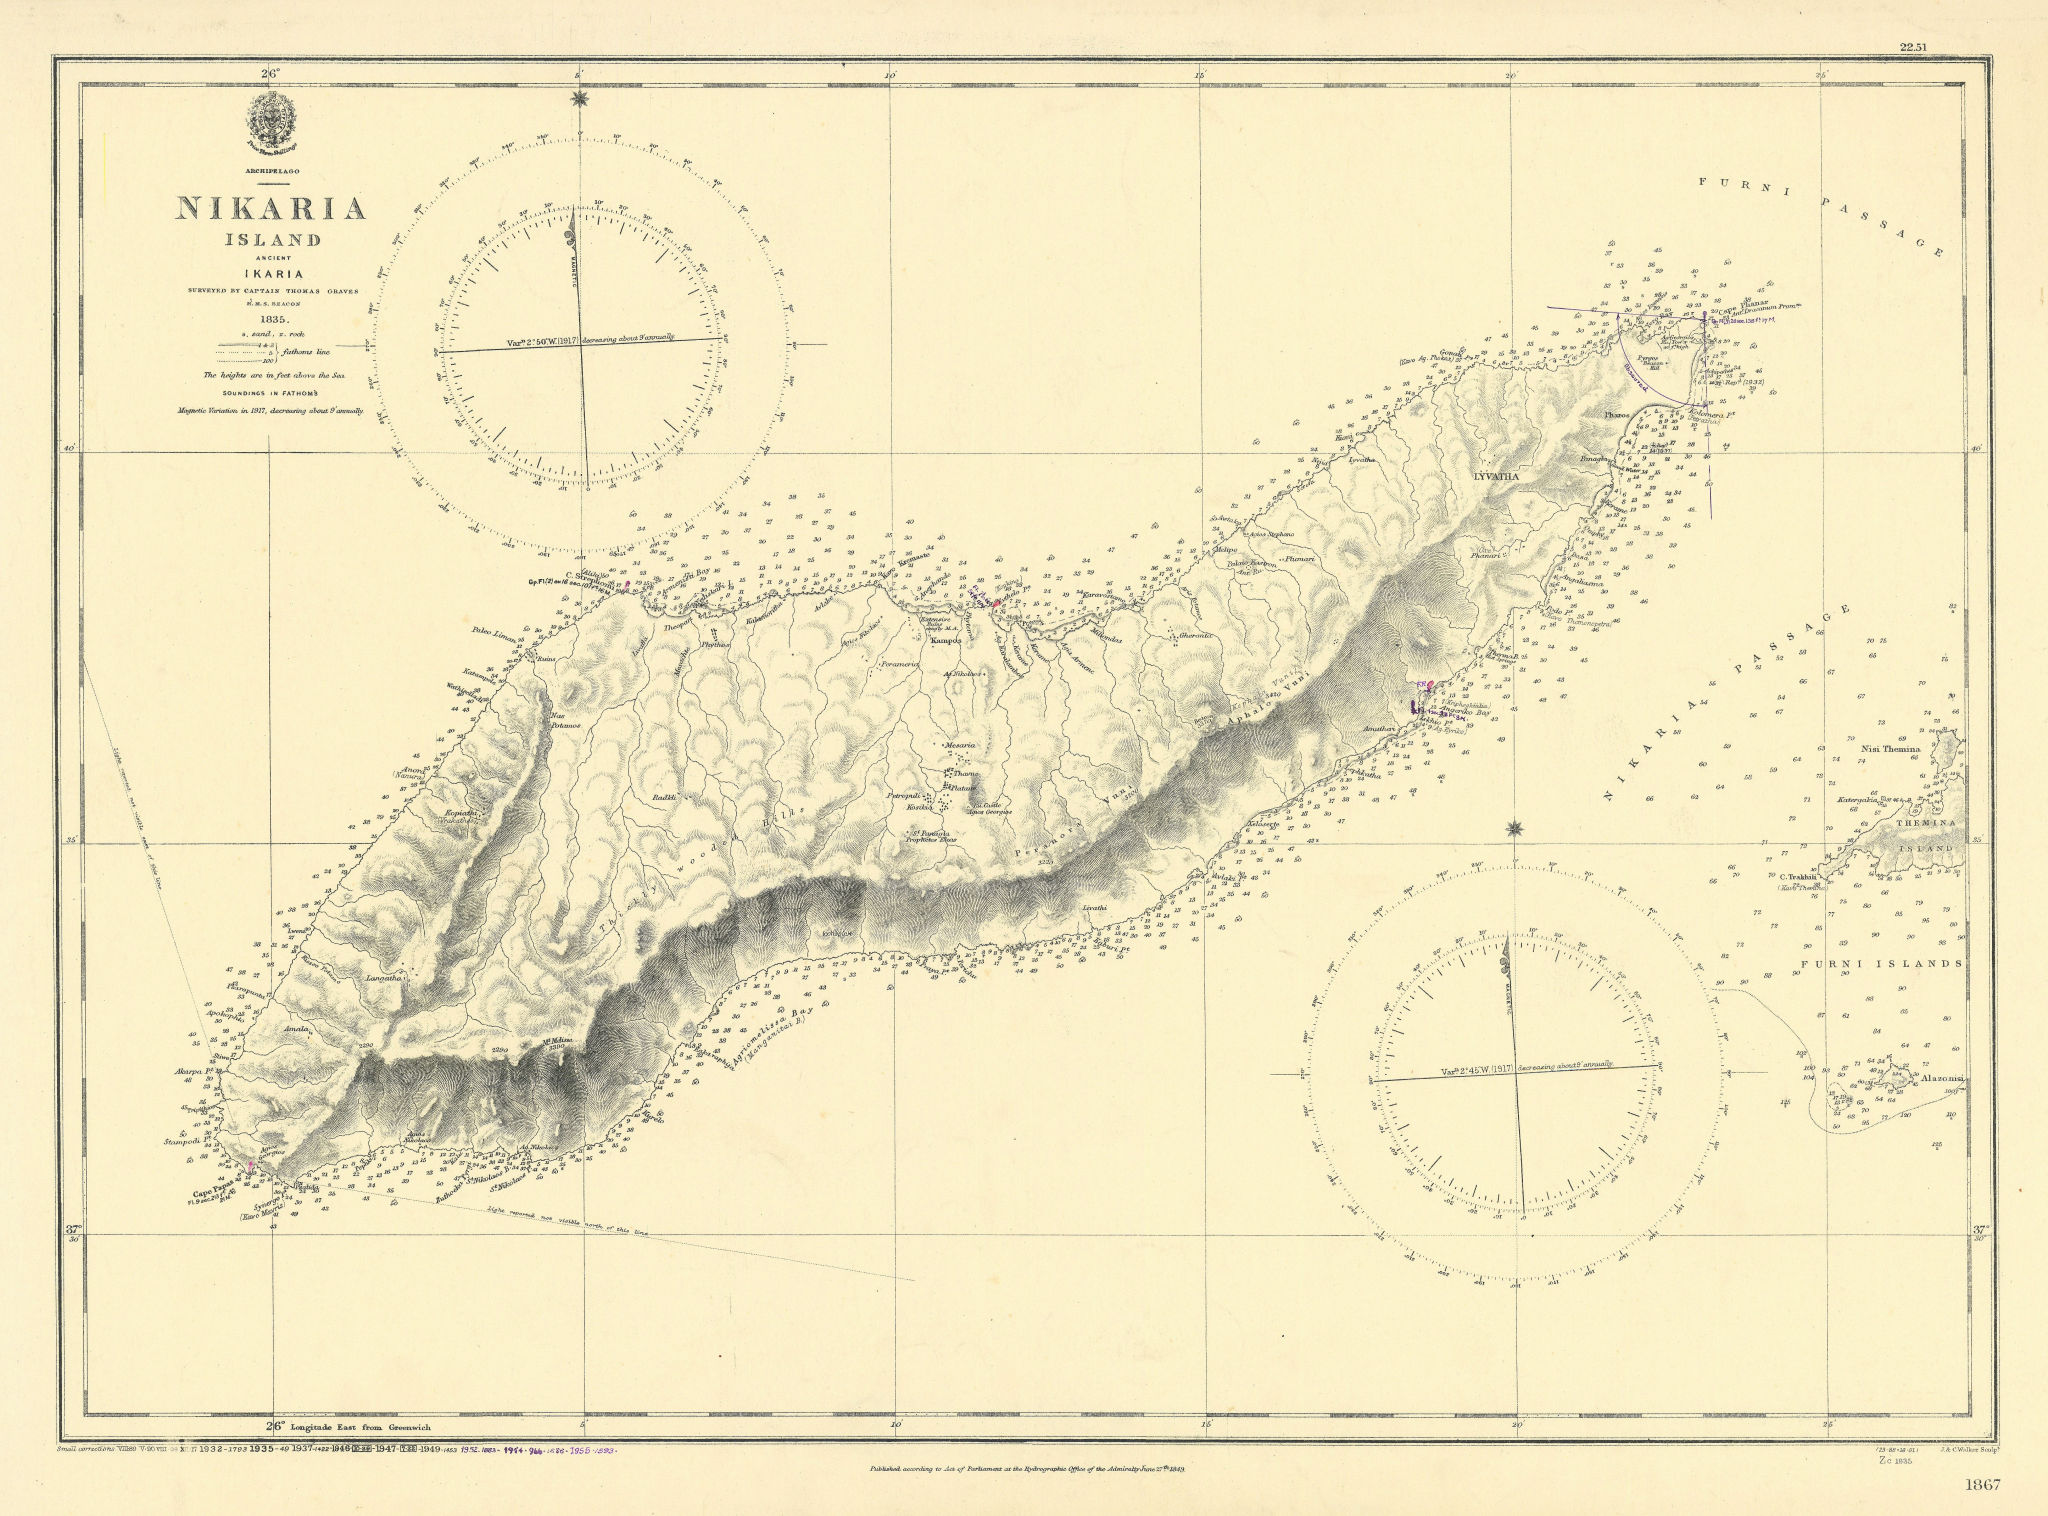 Nikaria Island Ikaria Icaria North Aegean Greece ADMIRALTY chart 1849 (1955) map